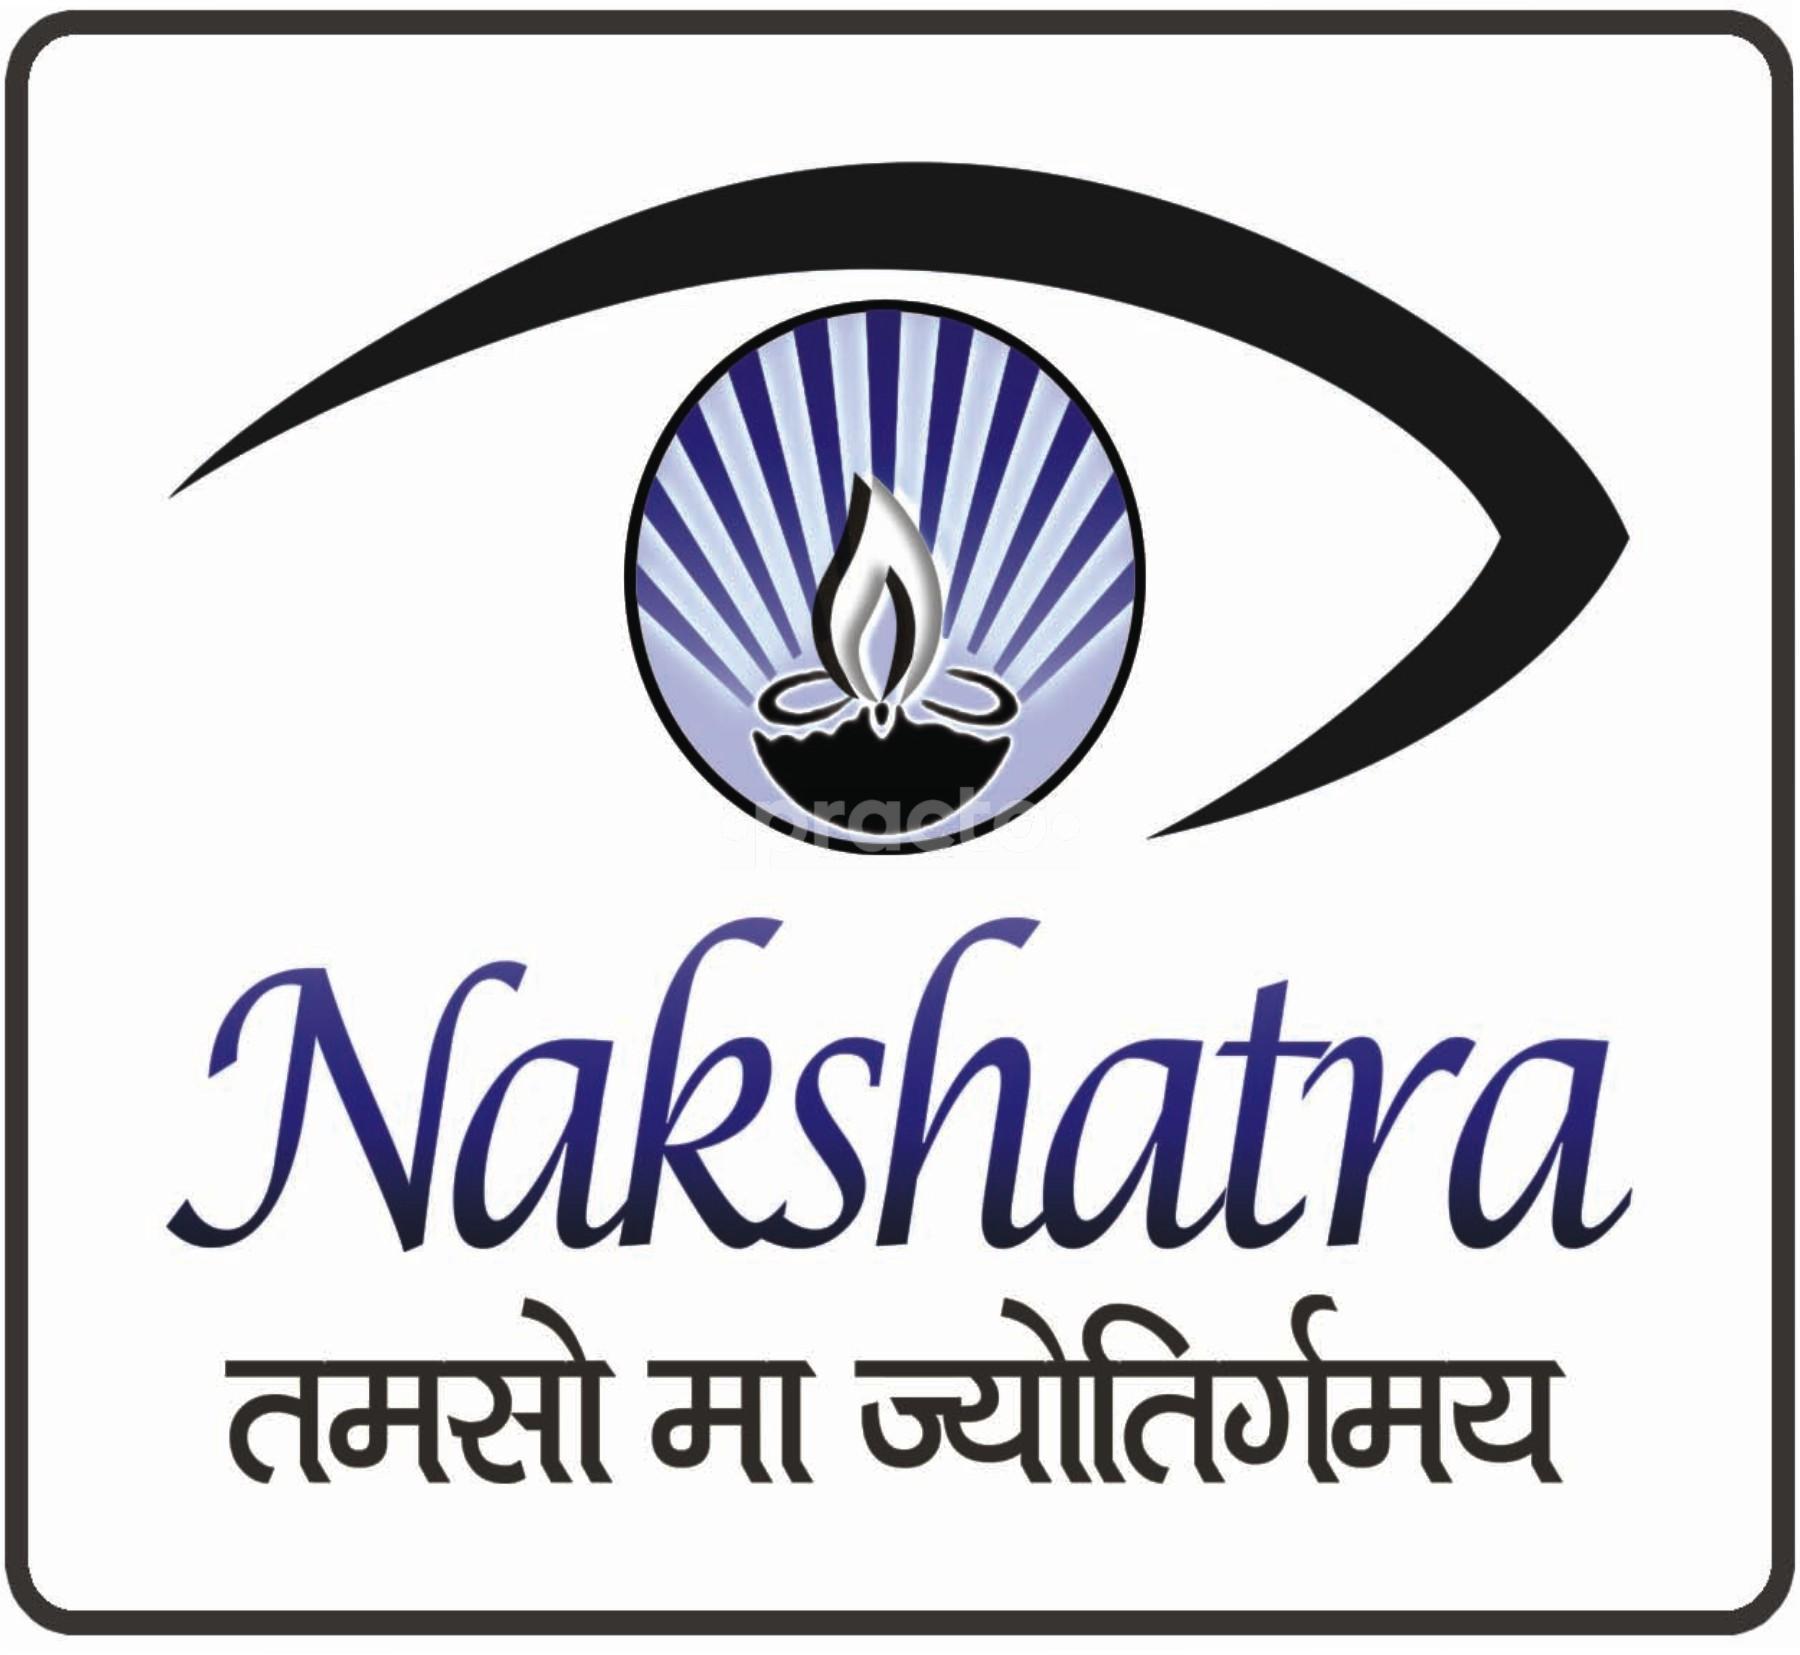 Nakshatra Eye Care